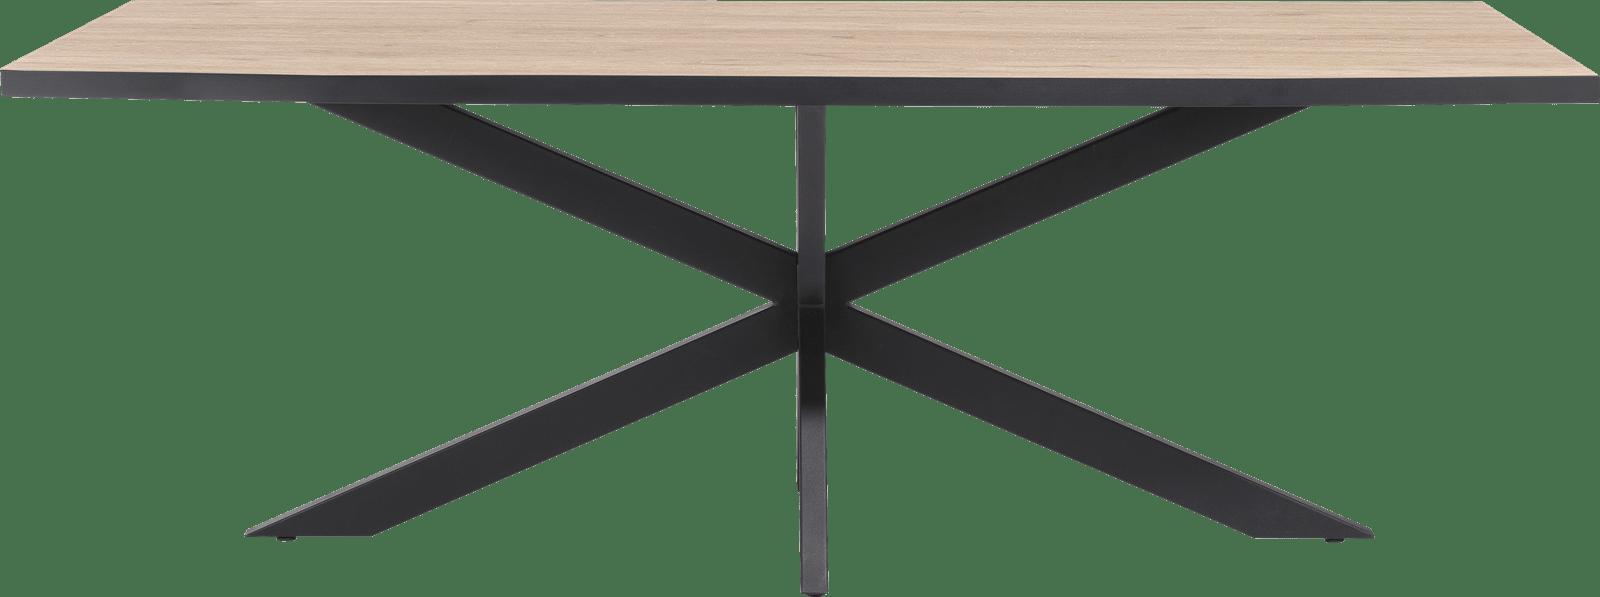 Henders & Hazel - Avalox - Industrie - tisch 230 x 98 cm